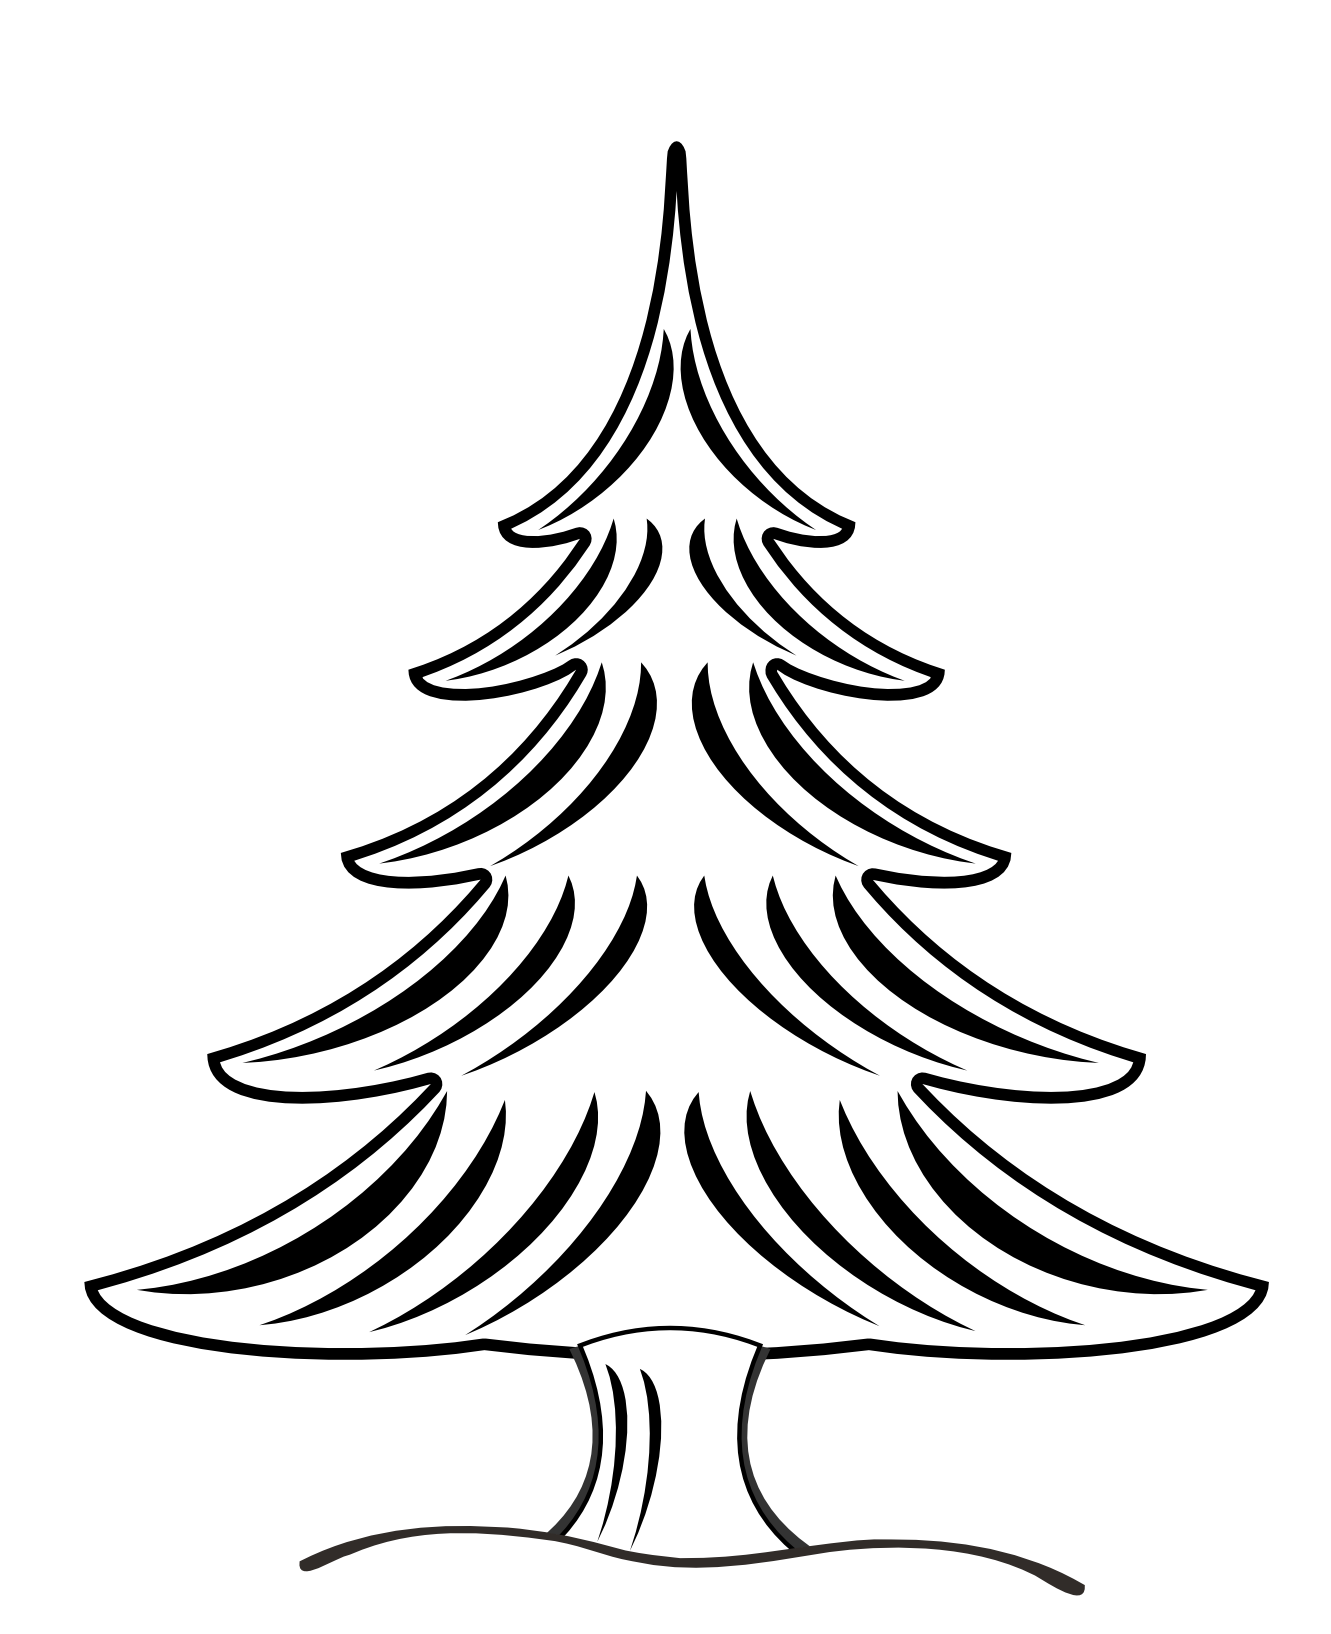 clip art black and white stock Christmas tree panda free. Trees clipart black and white